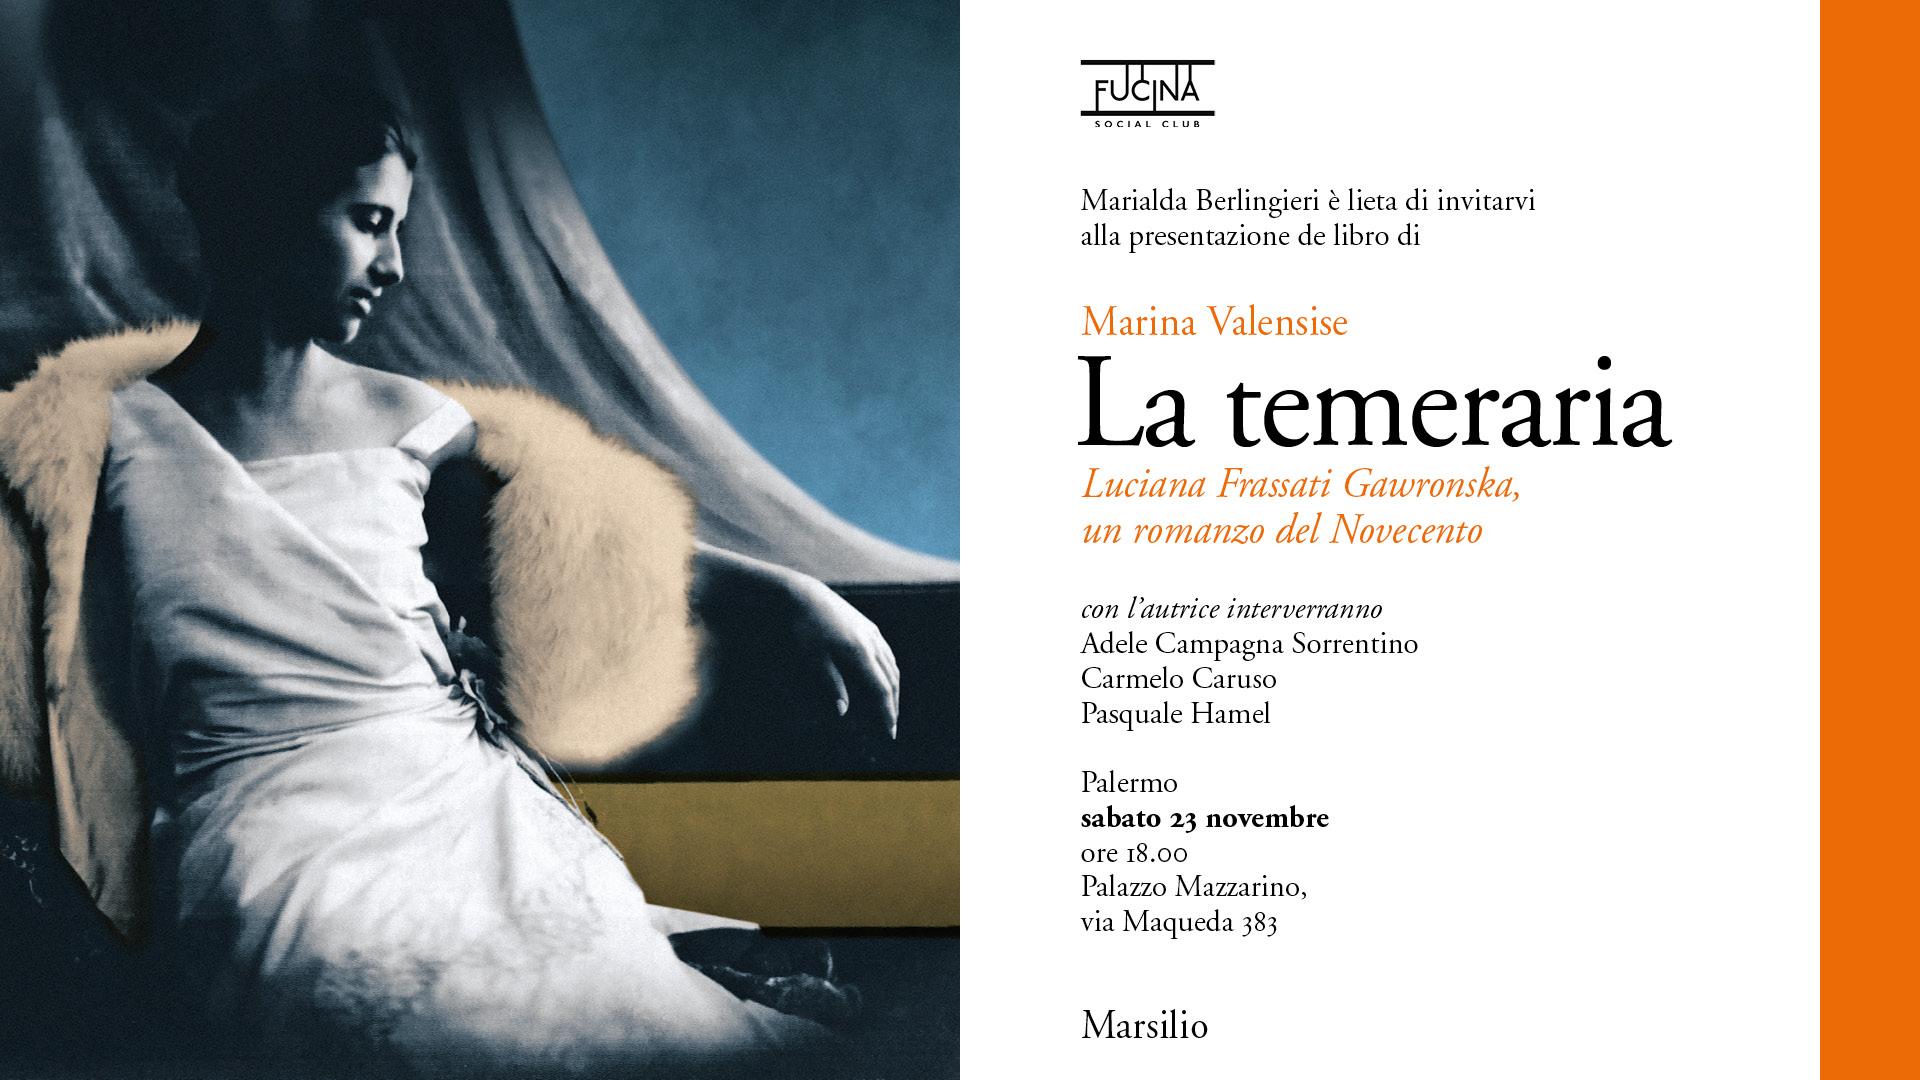 La Temeraria - Marina Valensise - Fucina Social Club